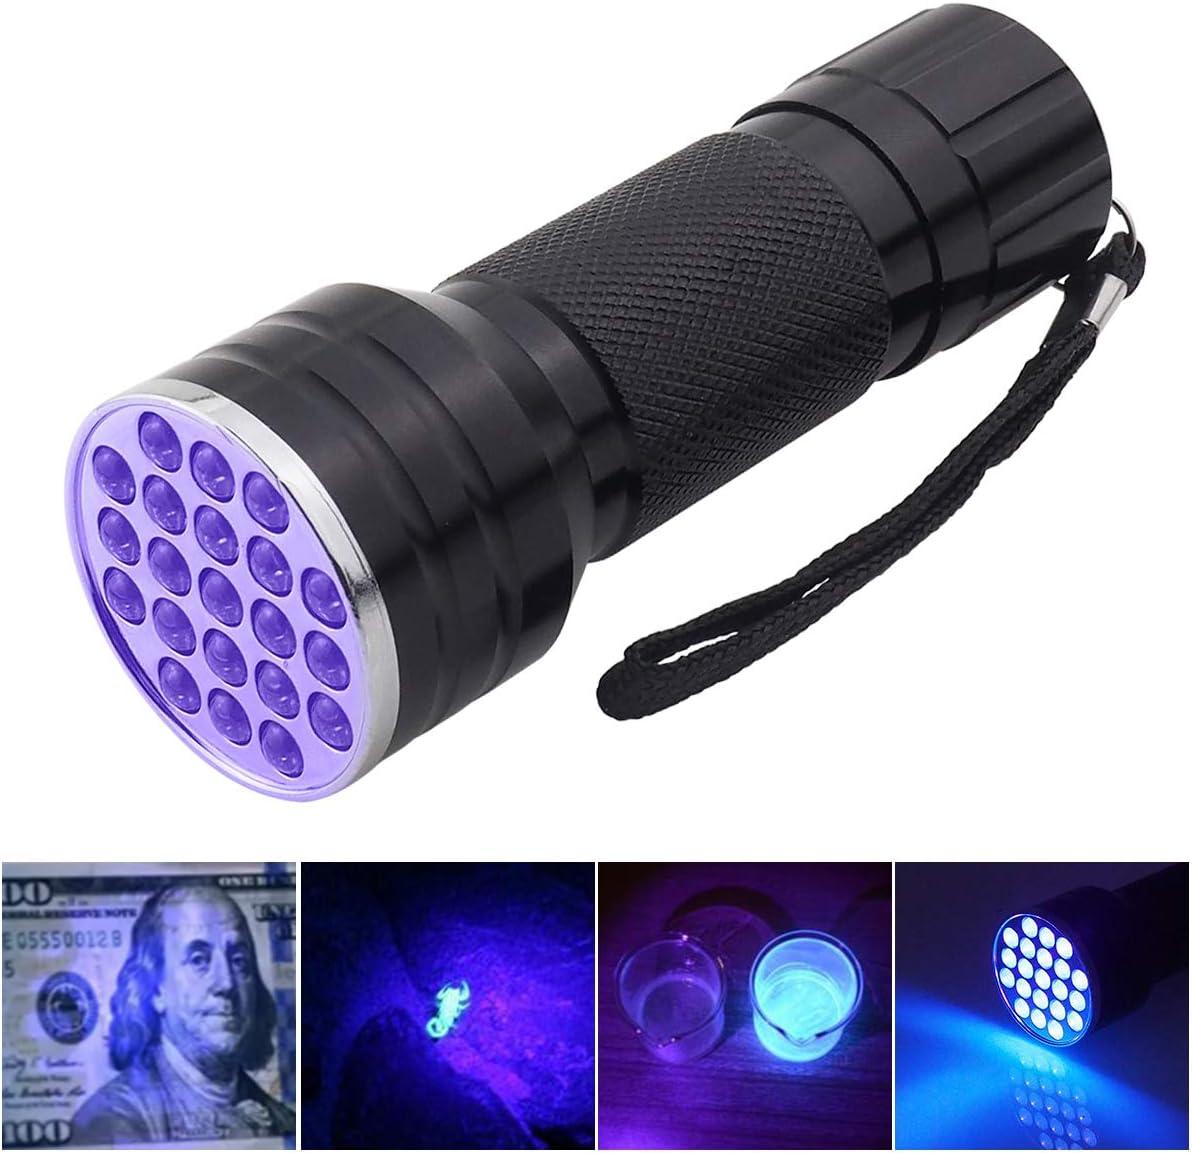 Pocketman UV Flashlight Black Light,2 in 1 UV Flashlight and Tactical Flashlight for Dog or Cat Urine on carpet Pet Stain /& Bed Bug or Camping,Hiking